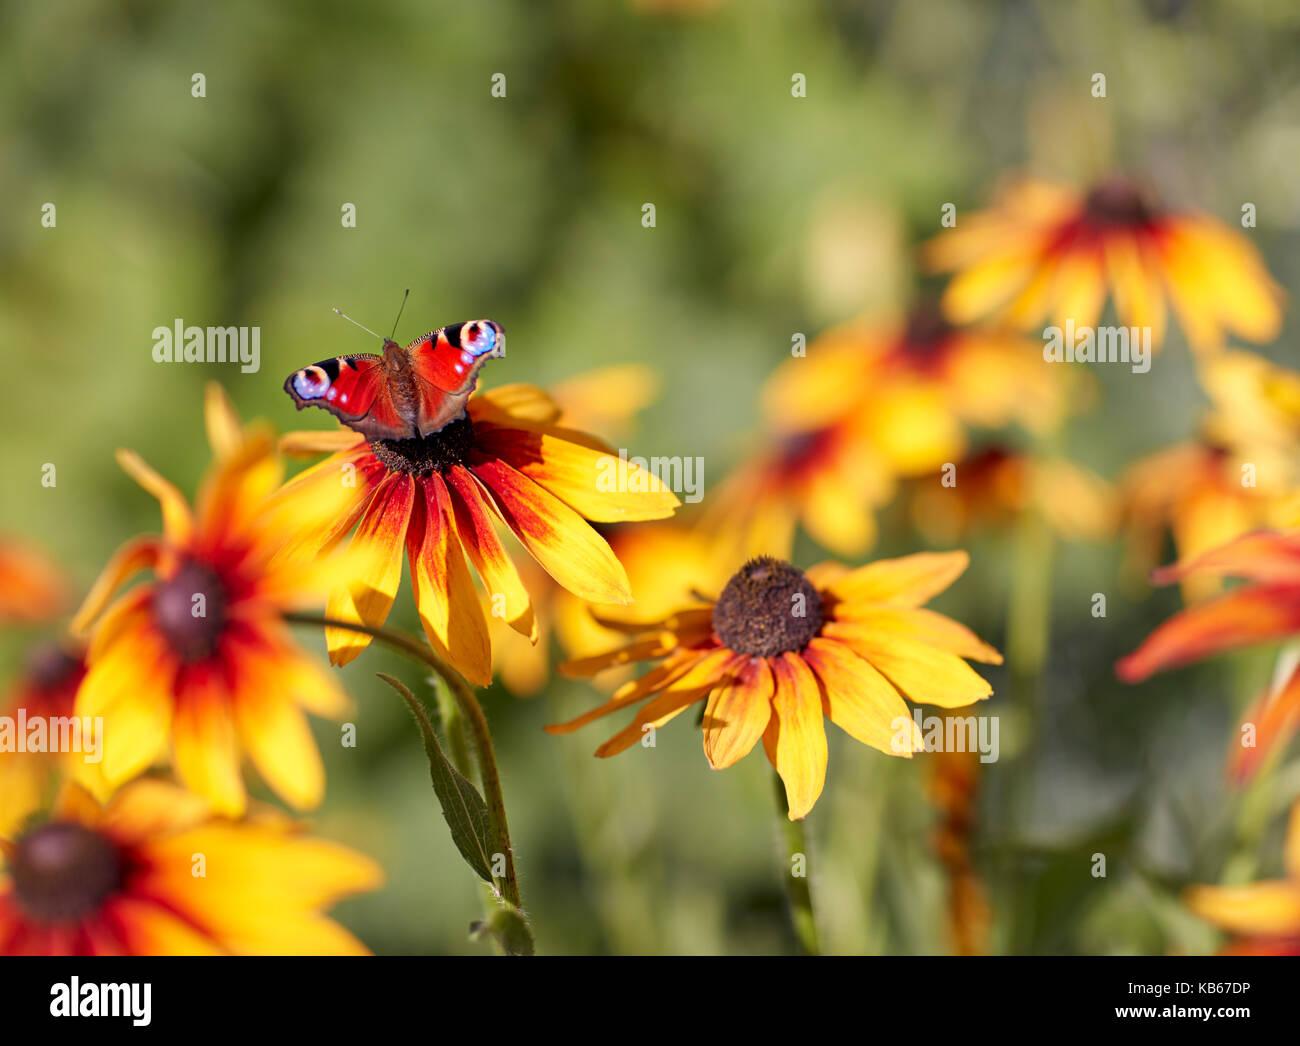 Tagpfauenauge (Nymphalis io) Rudbeckia hirta Rudbeckien () Blüte thront. Stockfoto